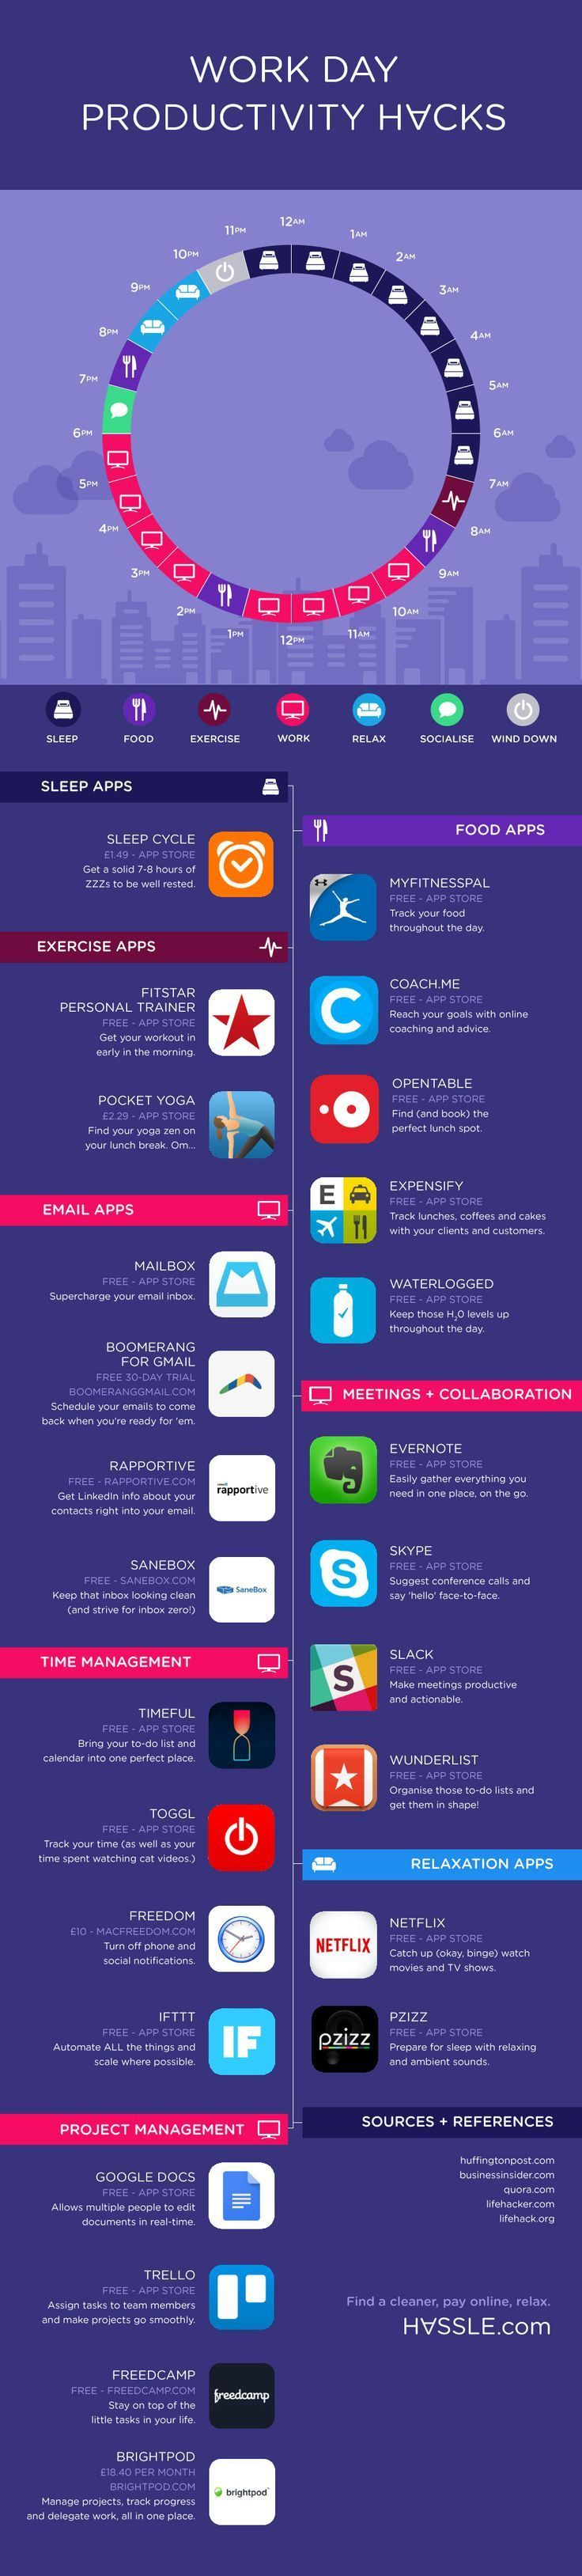 Best 25+ Productivity hacks ideas on Pinterest | Productivity ...